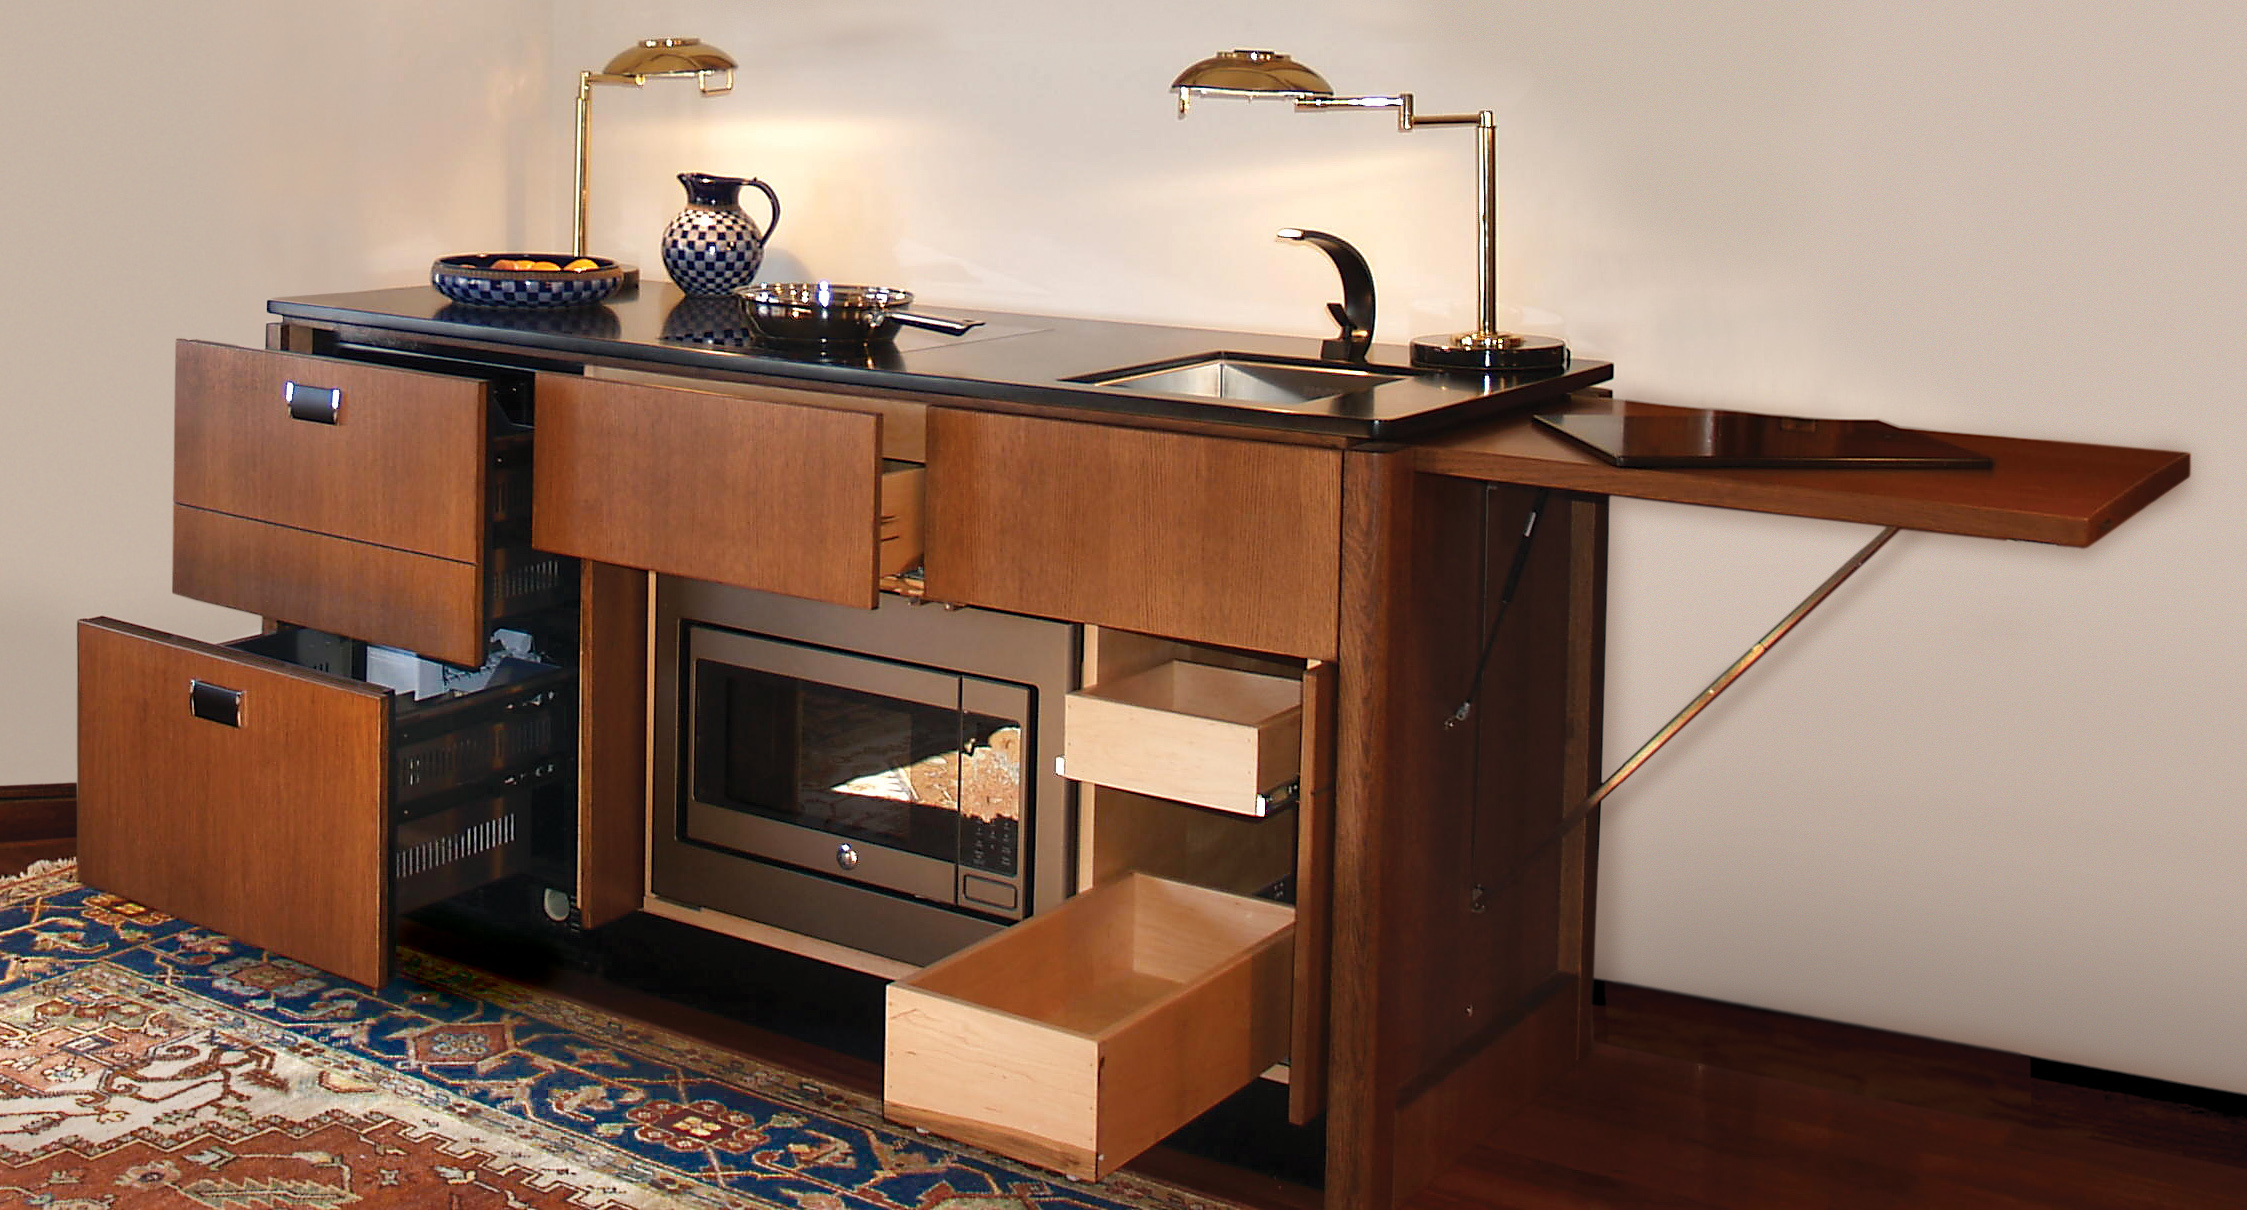 YesterTec Adds Islands to Hidden Kitchen Collection